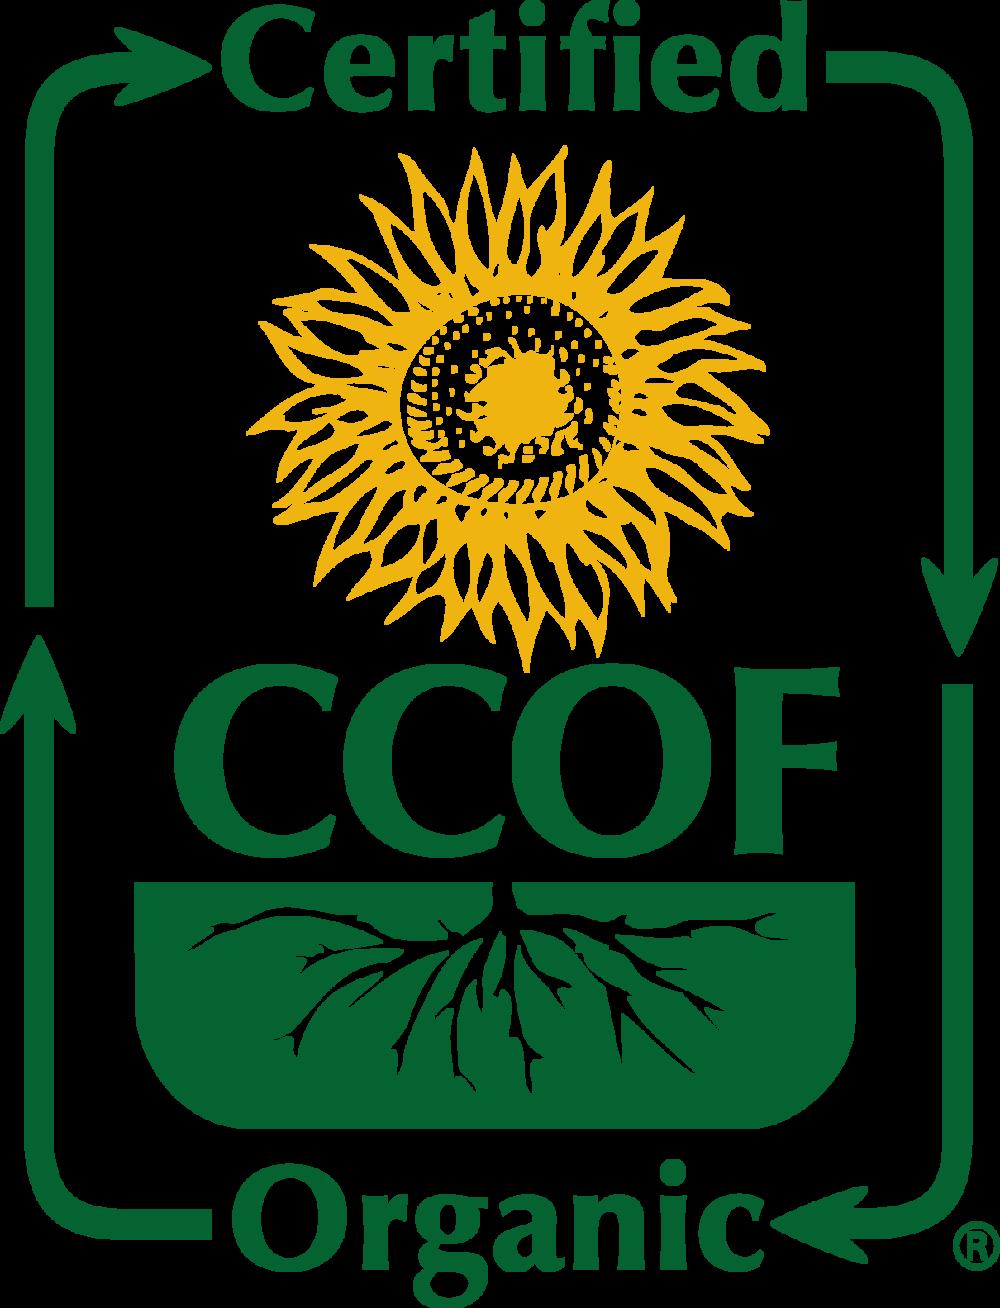 Ceritified CCOF Organic